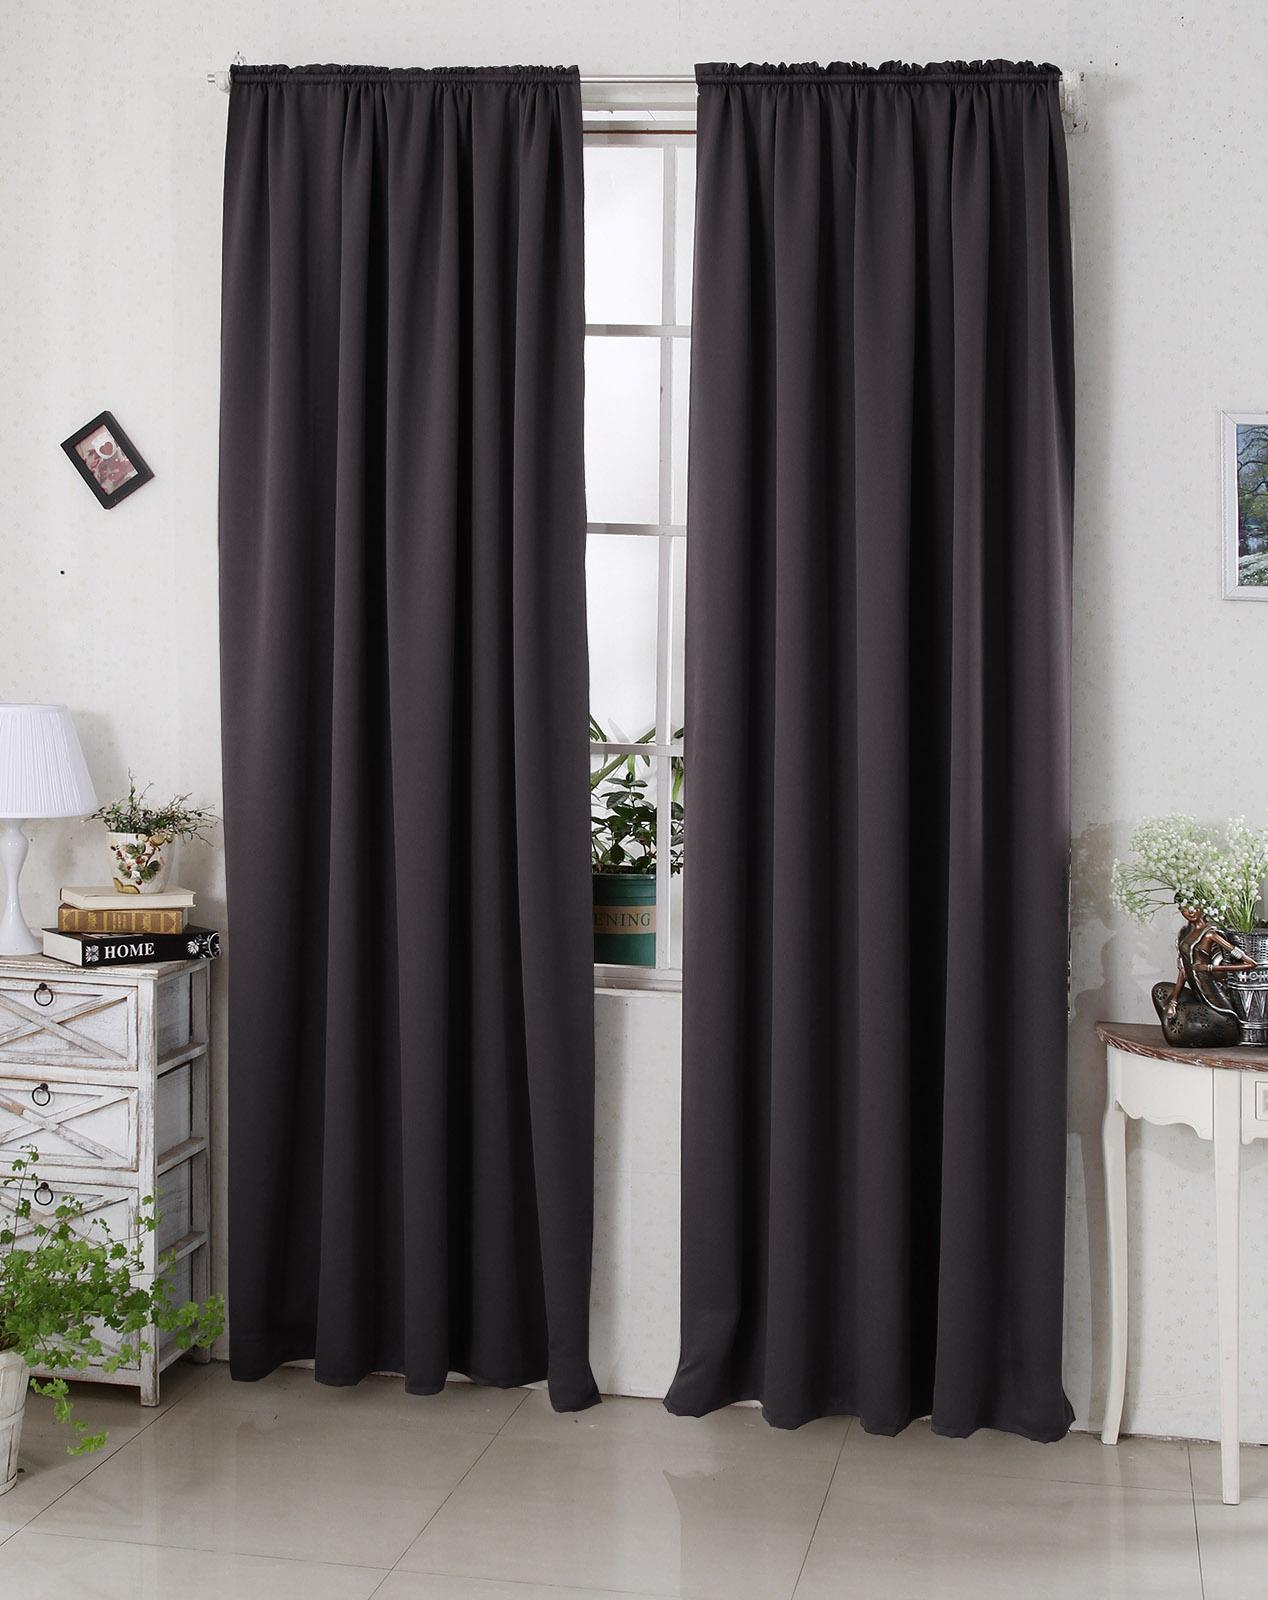 gardine vorhang blickdicht kr uselband thermogardine verdunkelungsgardine 330 ebay. Black Bedroom Furniture Sets. Home Design Ideas